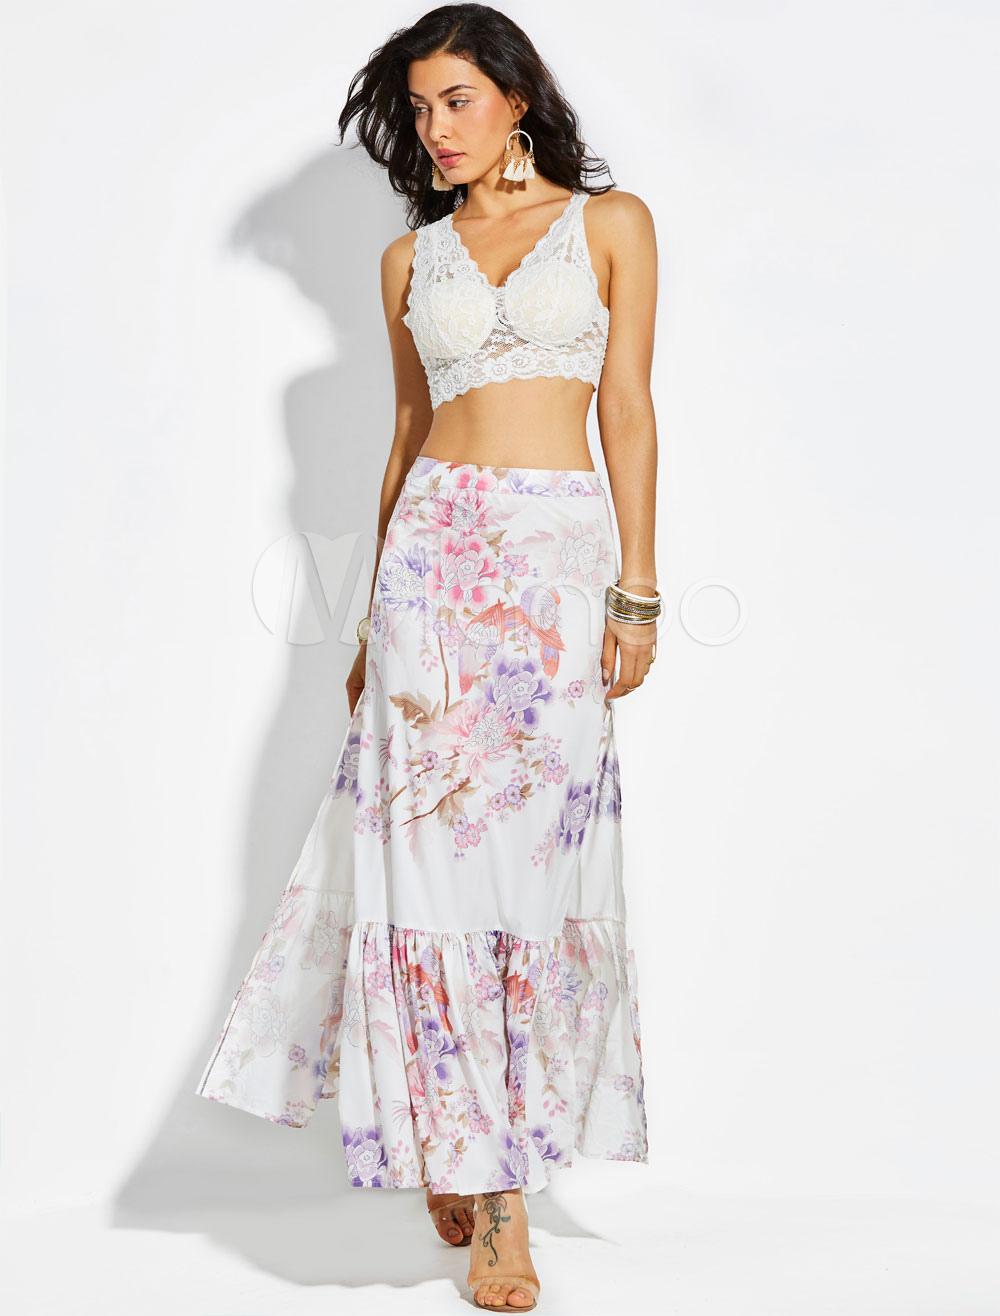 White Women Skirt Floral Ruffle Slit Long Chiffon Skirt